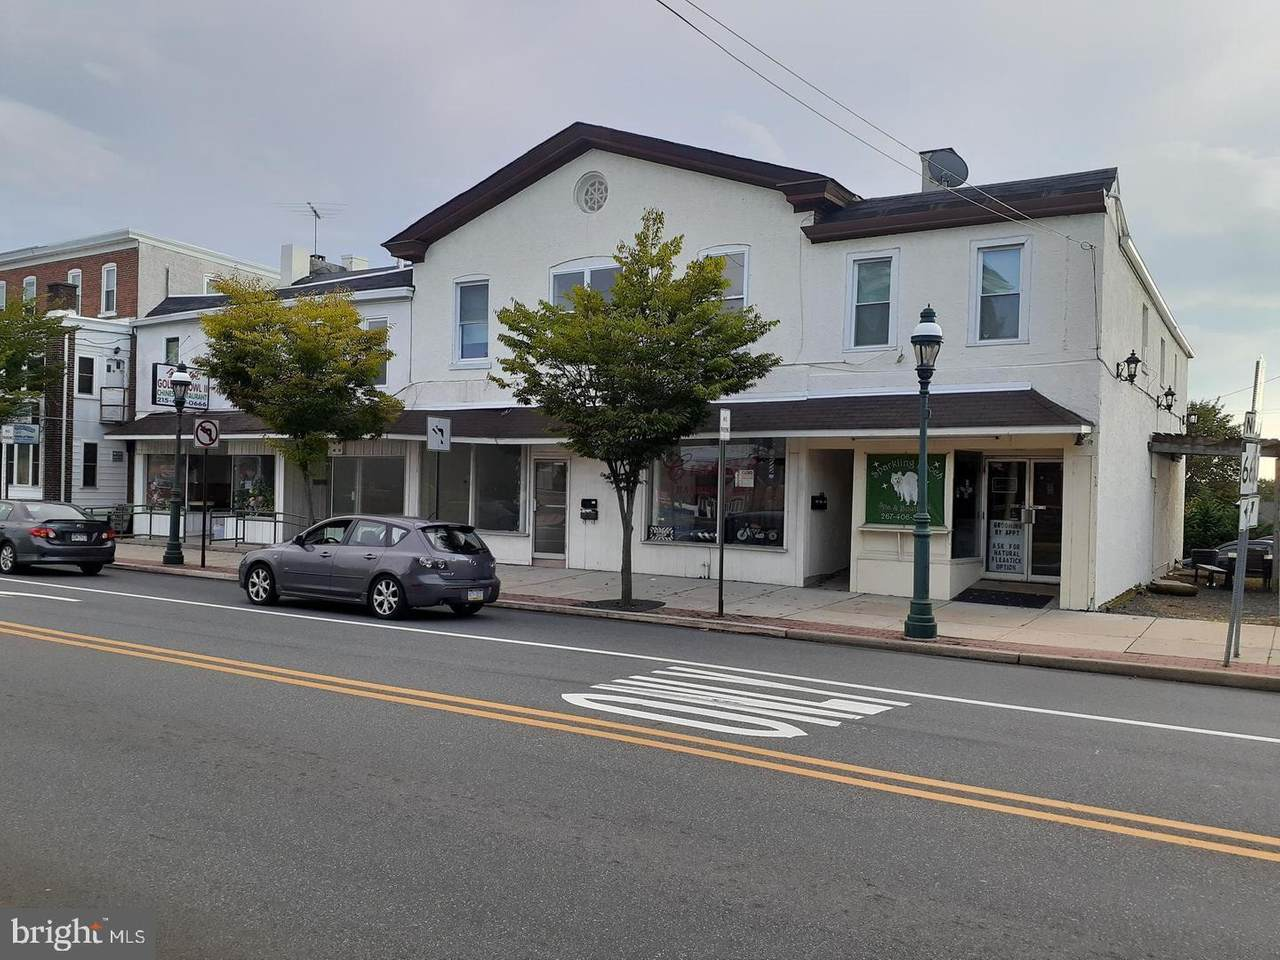 351 Main Street - Photo 1